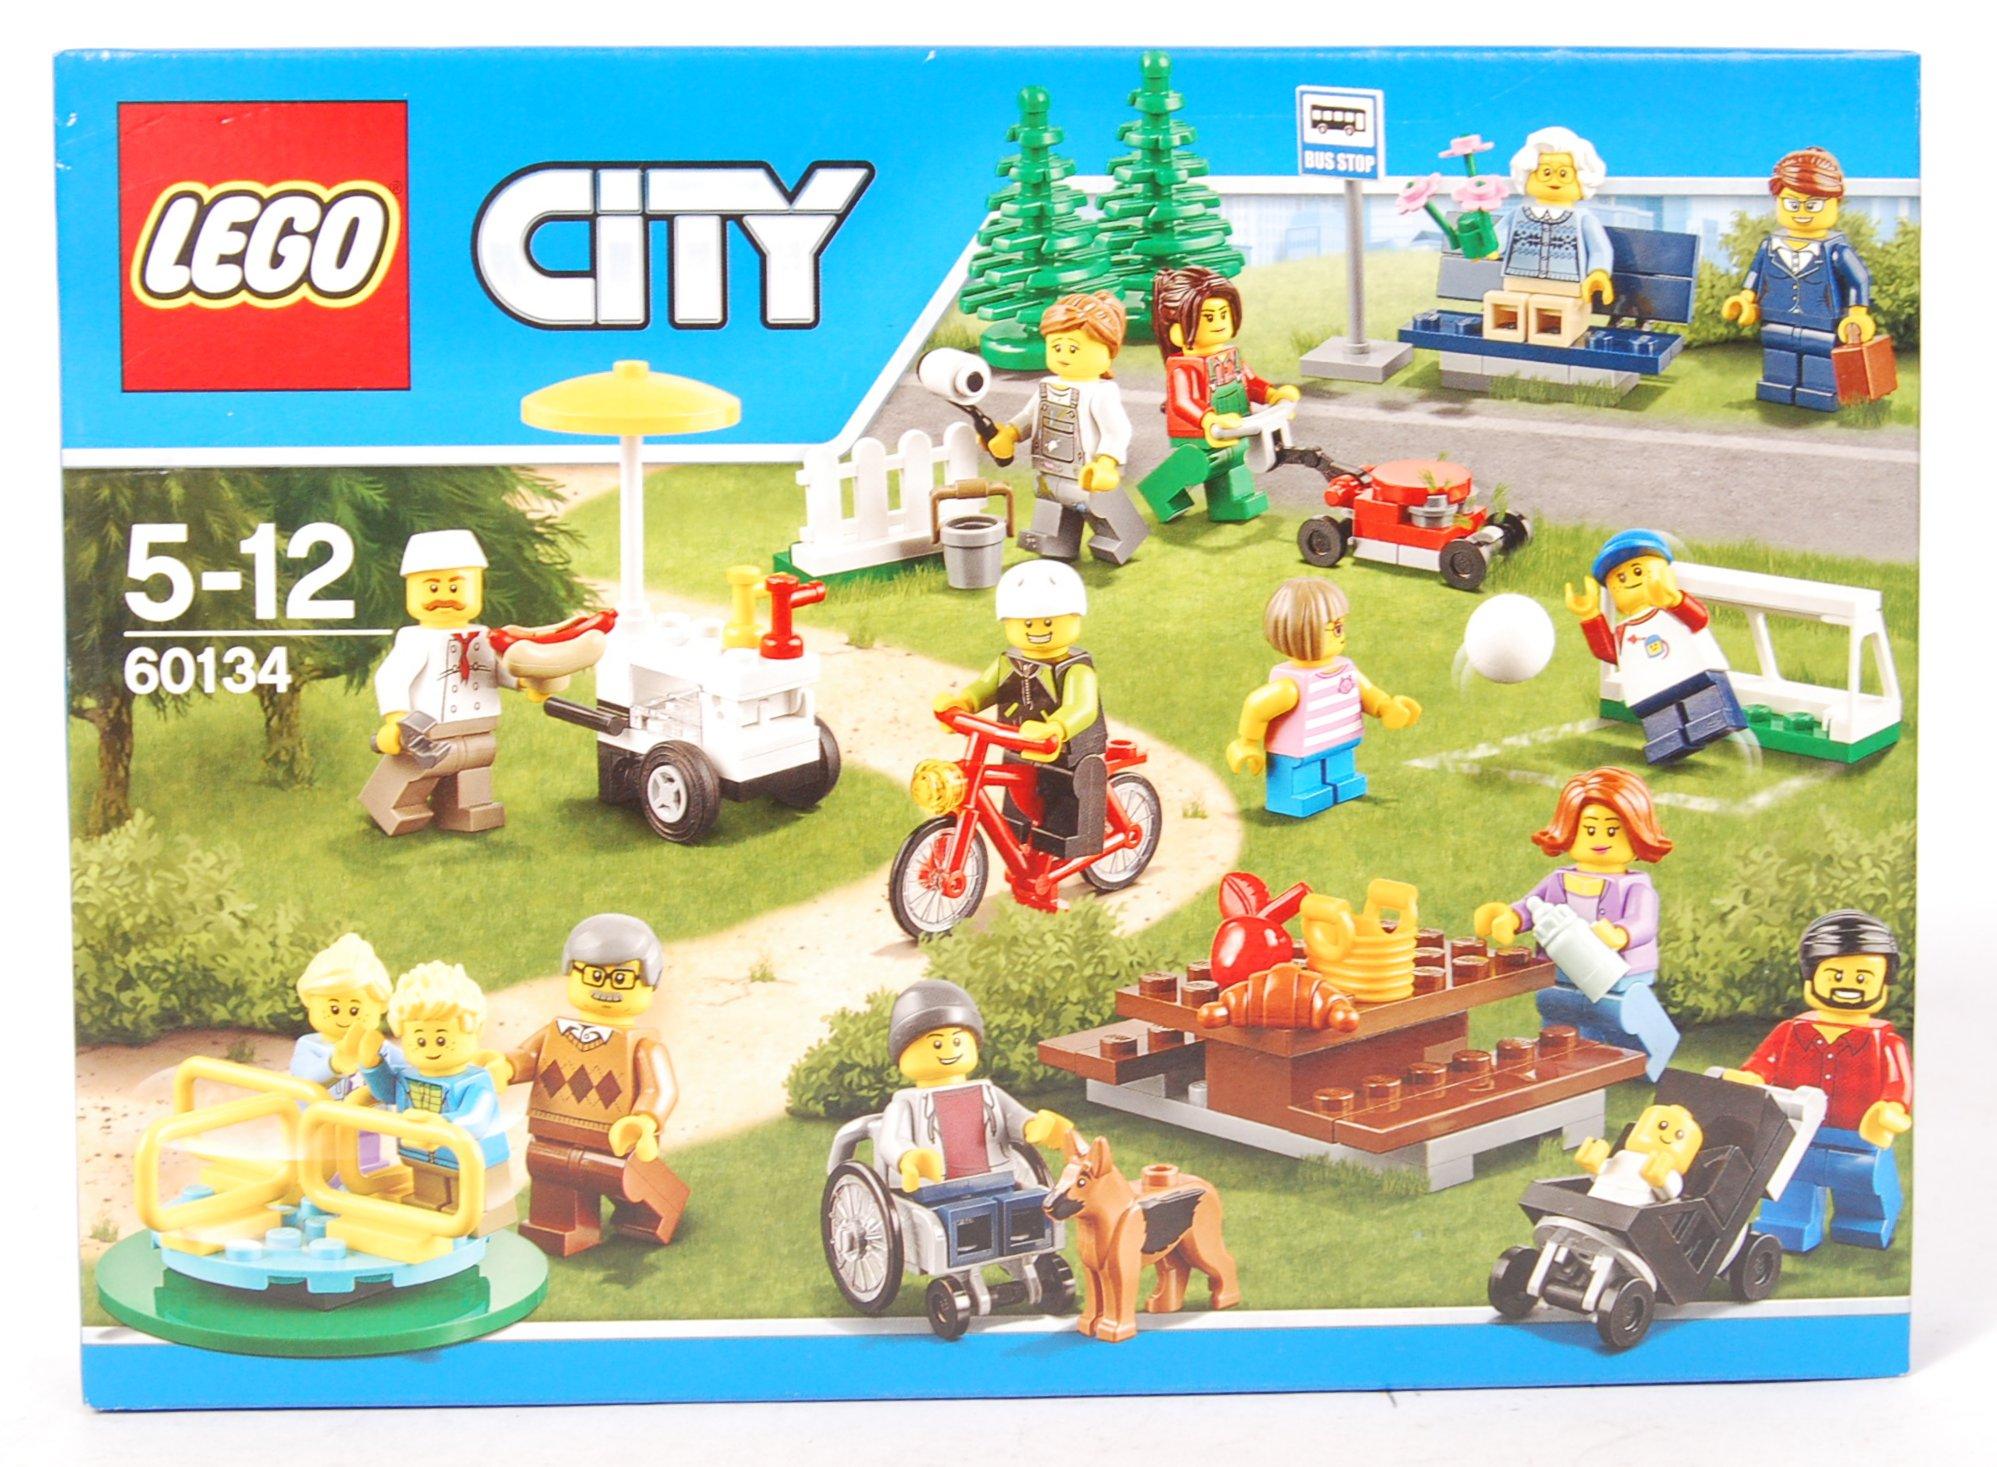 LEGO CITY SET NO. 60134 FUN IN THE PARK